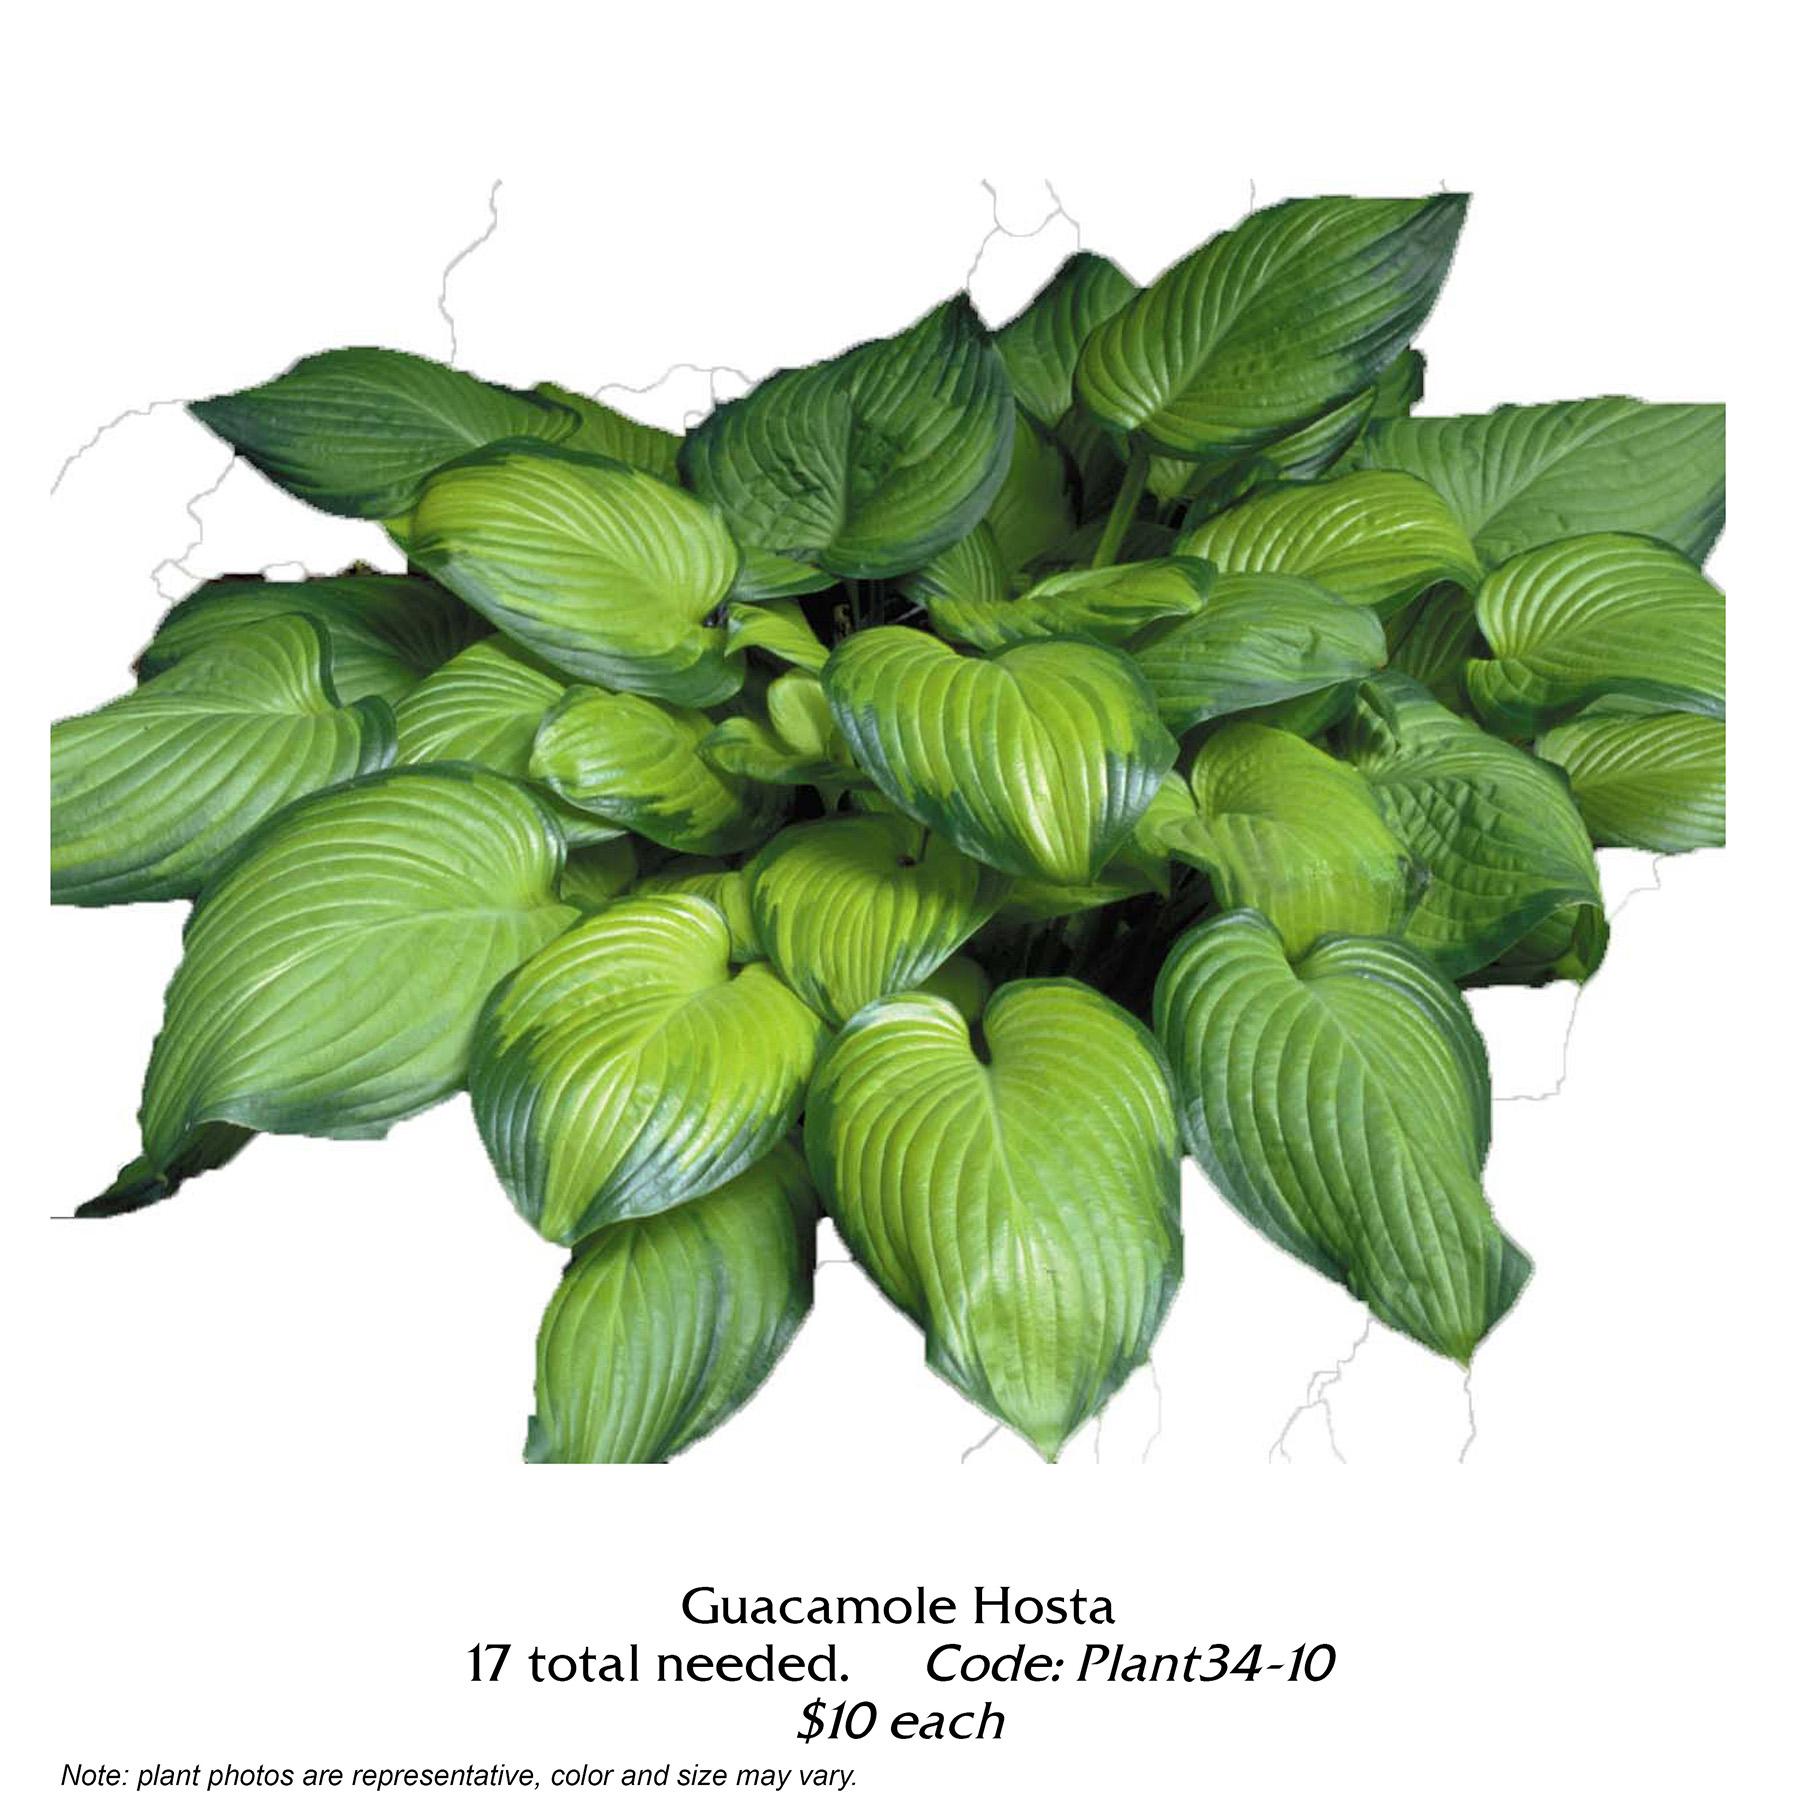 Guacamole Hosta.jpg